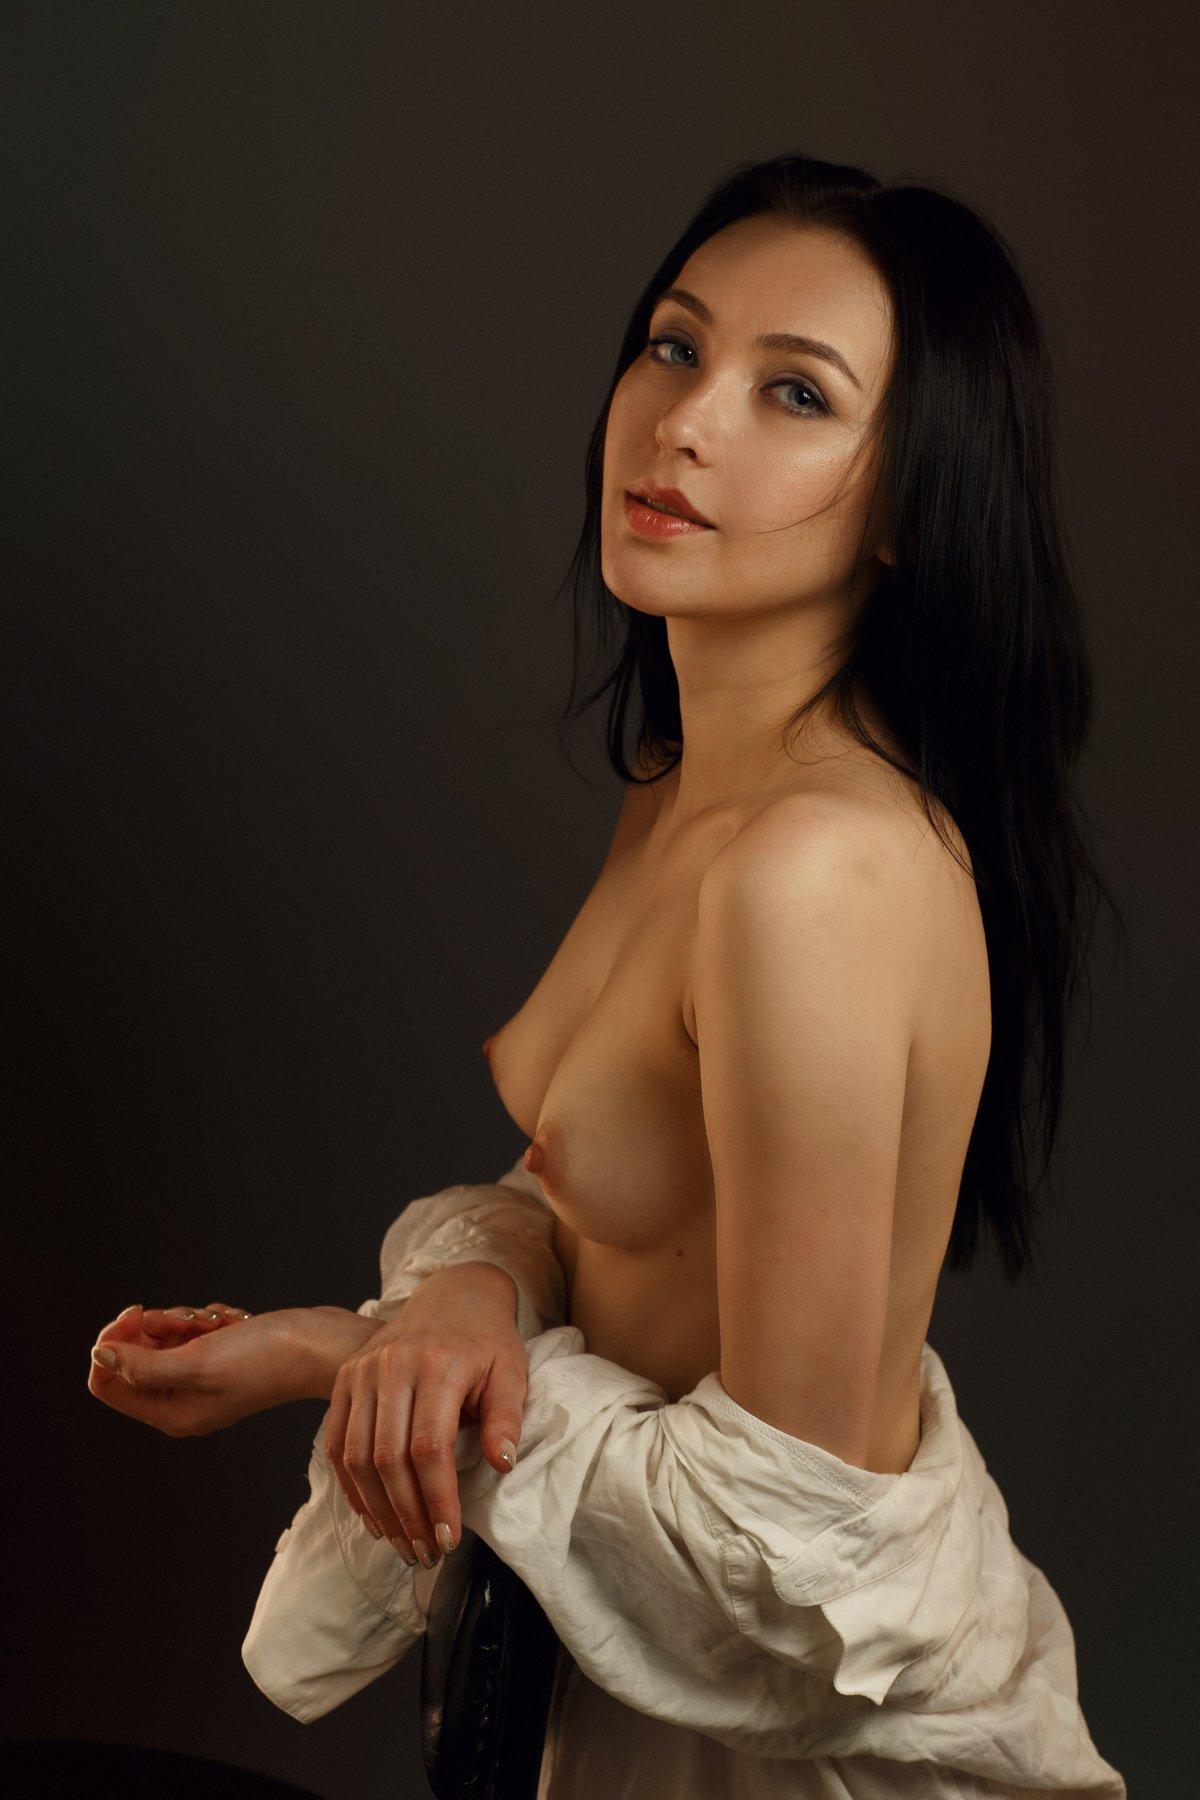 art, artnude beautiful, girl, light, nu, nude, sexy, studio, sweet, woman, ню, девушка, модель, ню, портрет, portrait, Сергей Сорокин